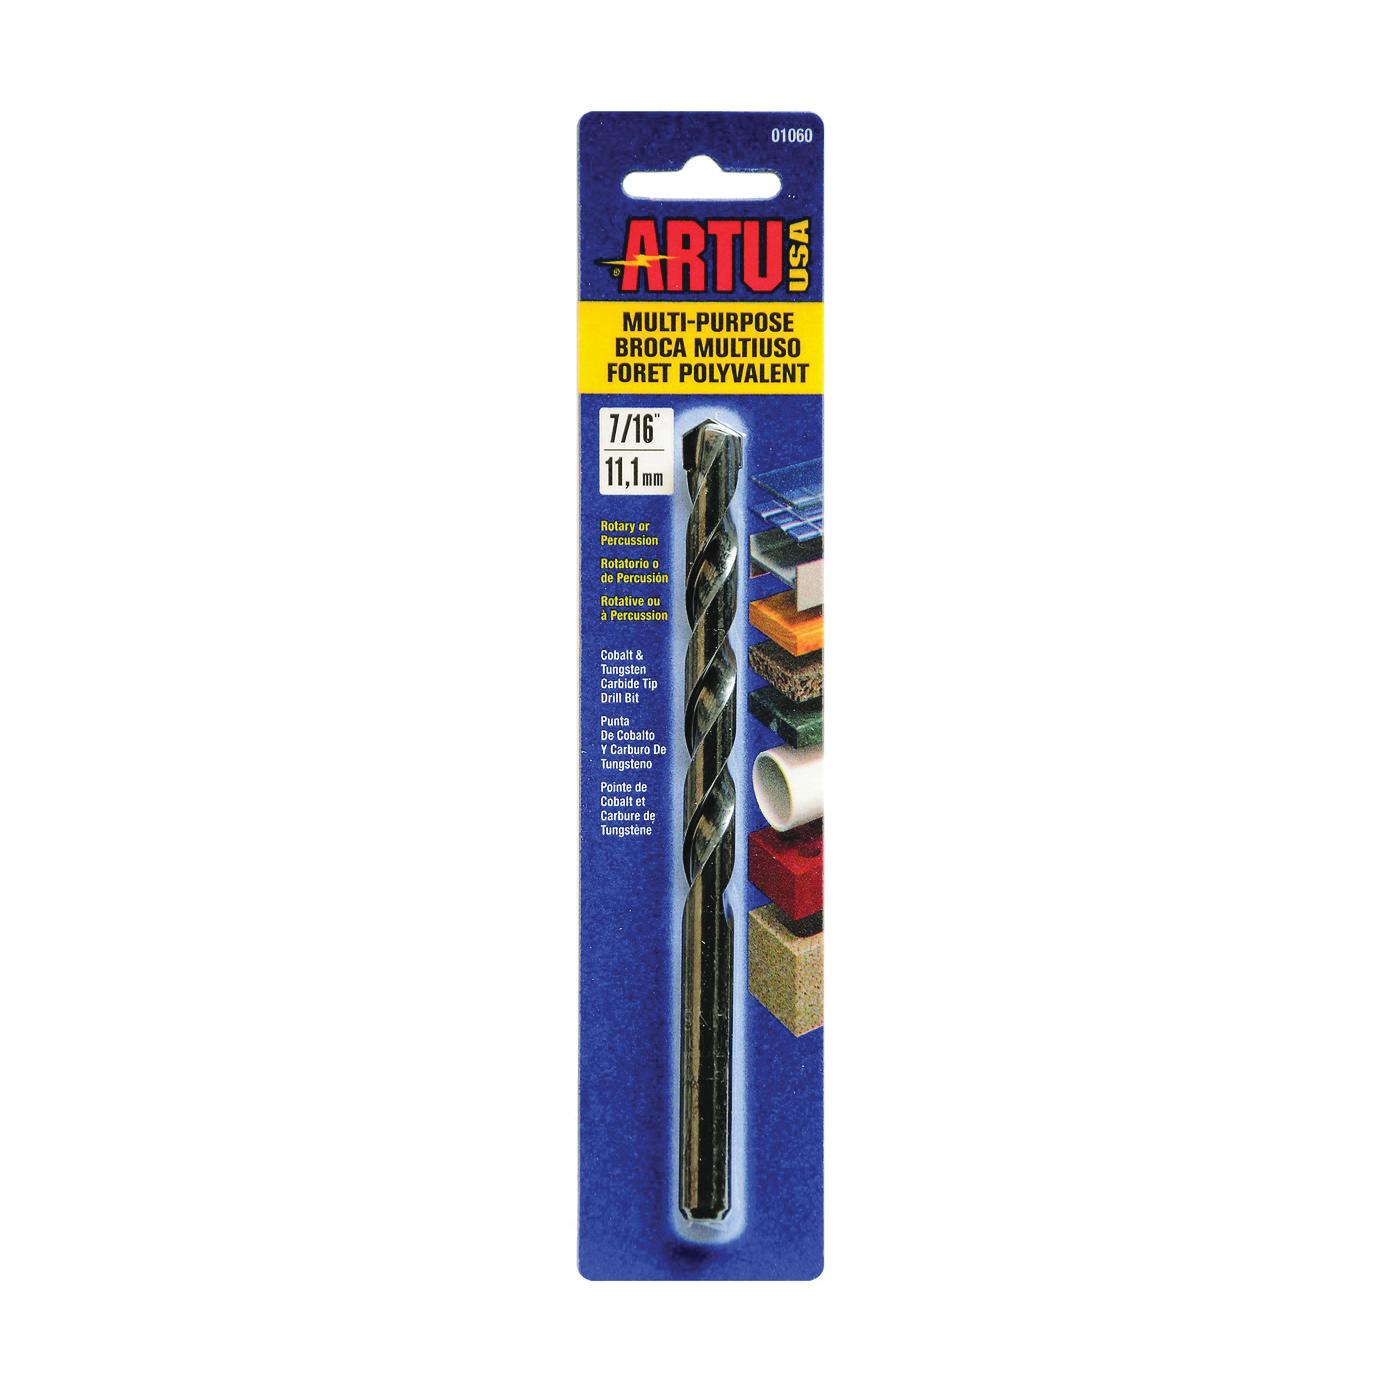 Picture of ARTU 01060 Drill Bit, 7/16 in Dia, 6-1/8 in OAL, Jobber Bit, Parabolic Flute, 3/8 in Dia Shank, Reduced Shank